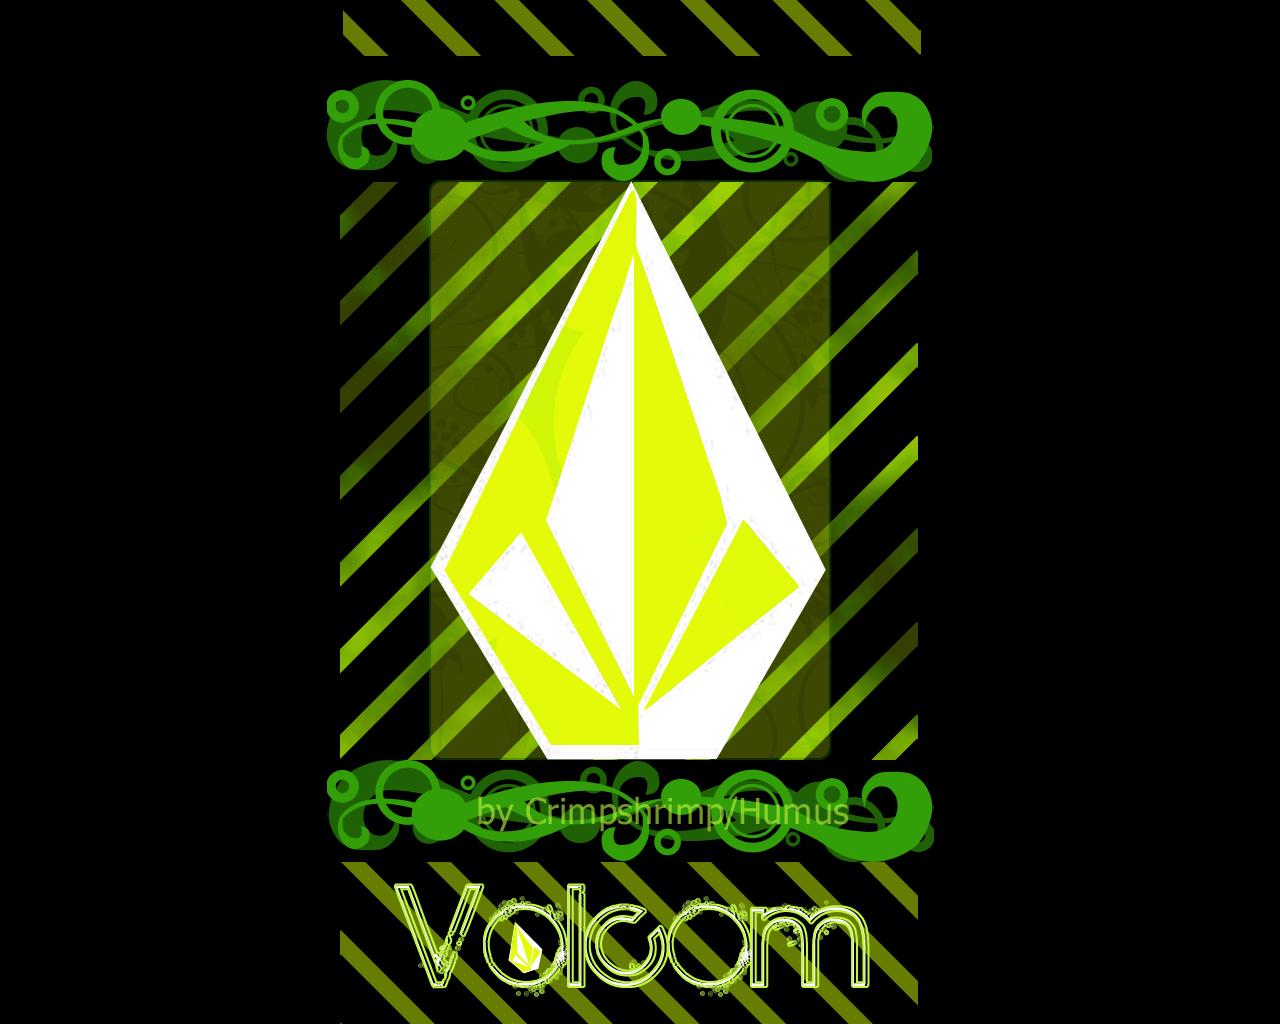 78 Volcom Wallpaper On Wallpapersafari